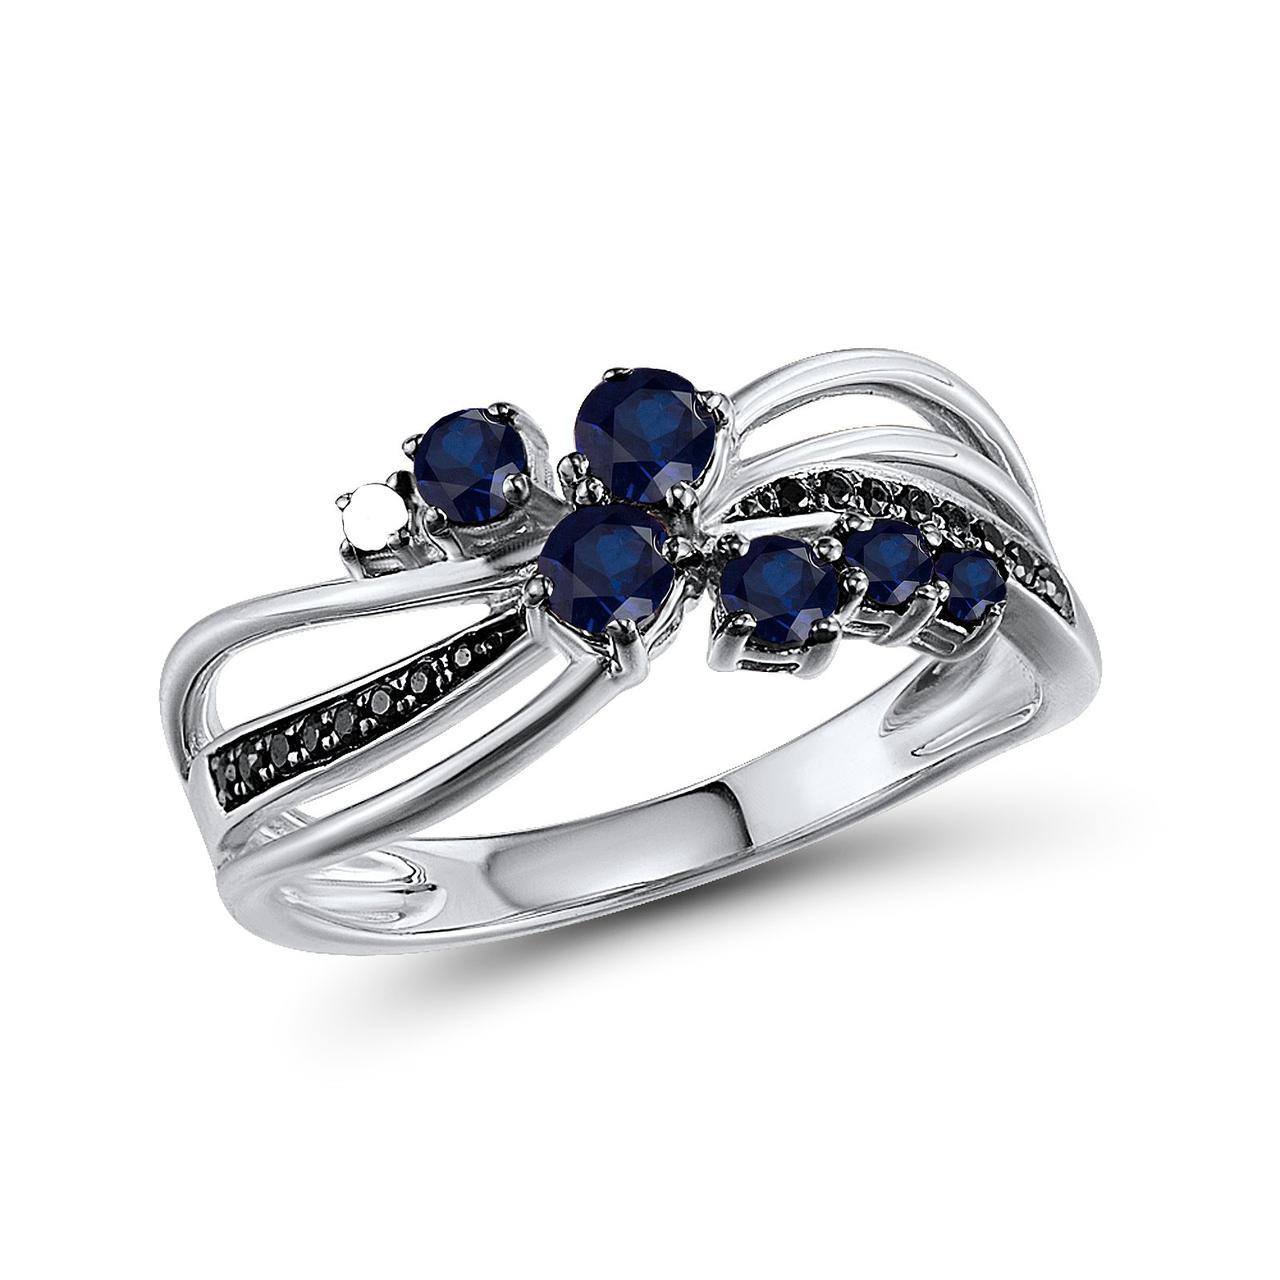 Золотое кольцо с бриллиантами и сапфирами, размер 16 (259009)